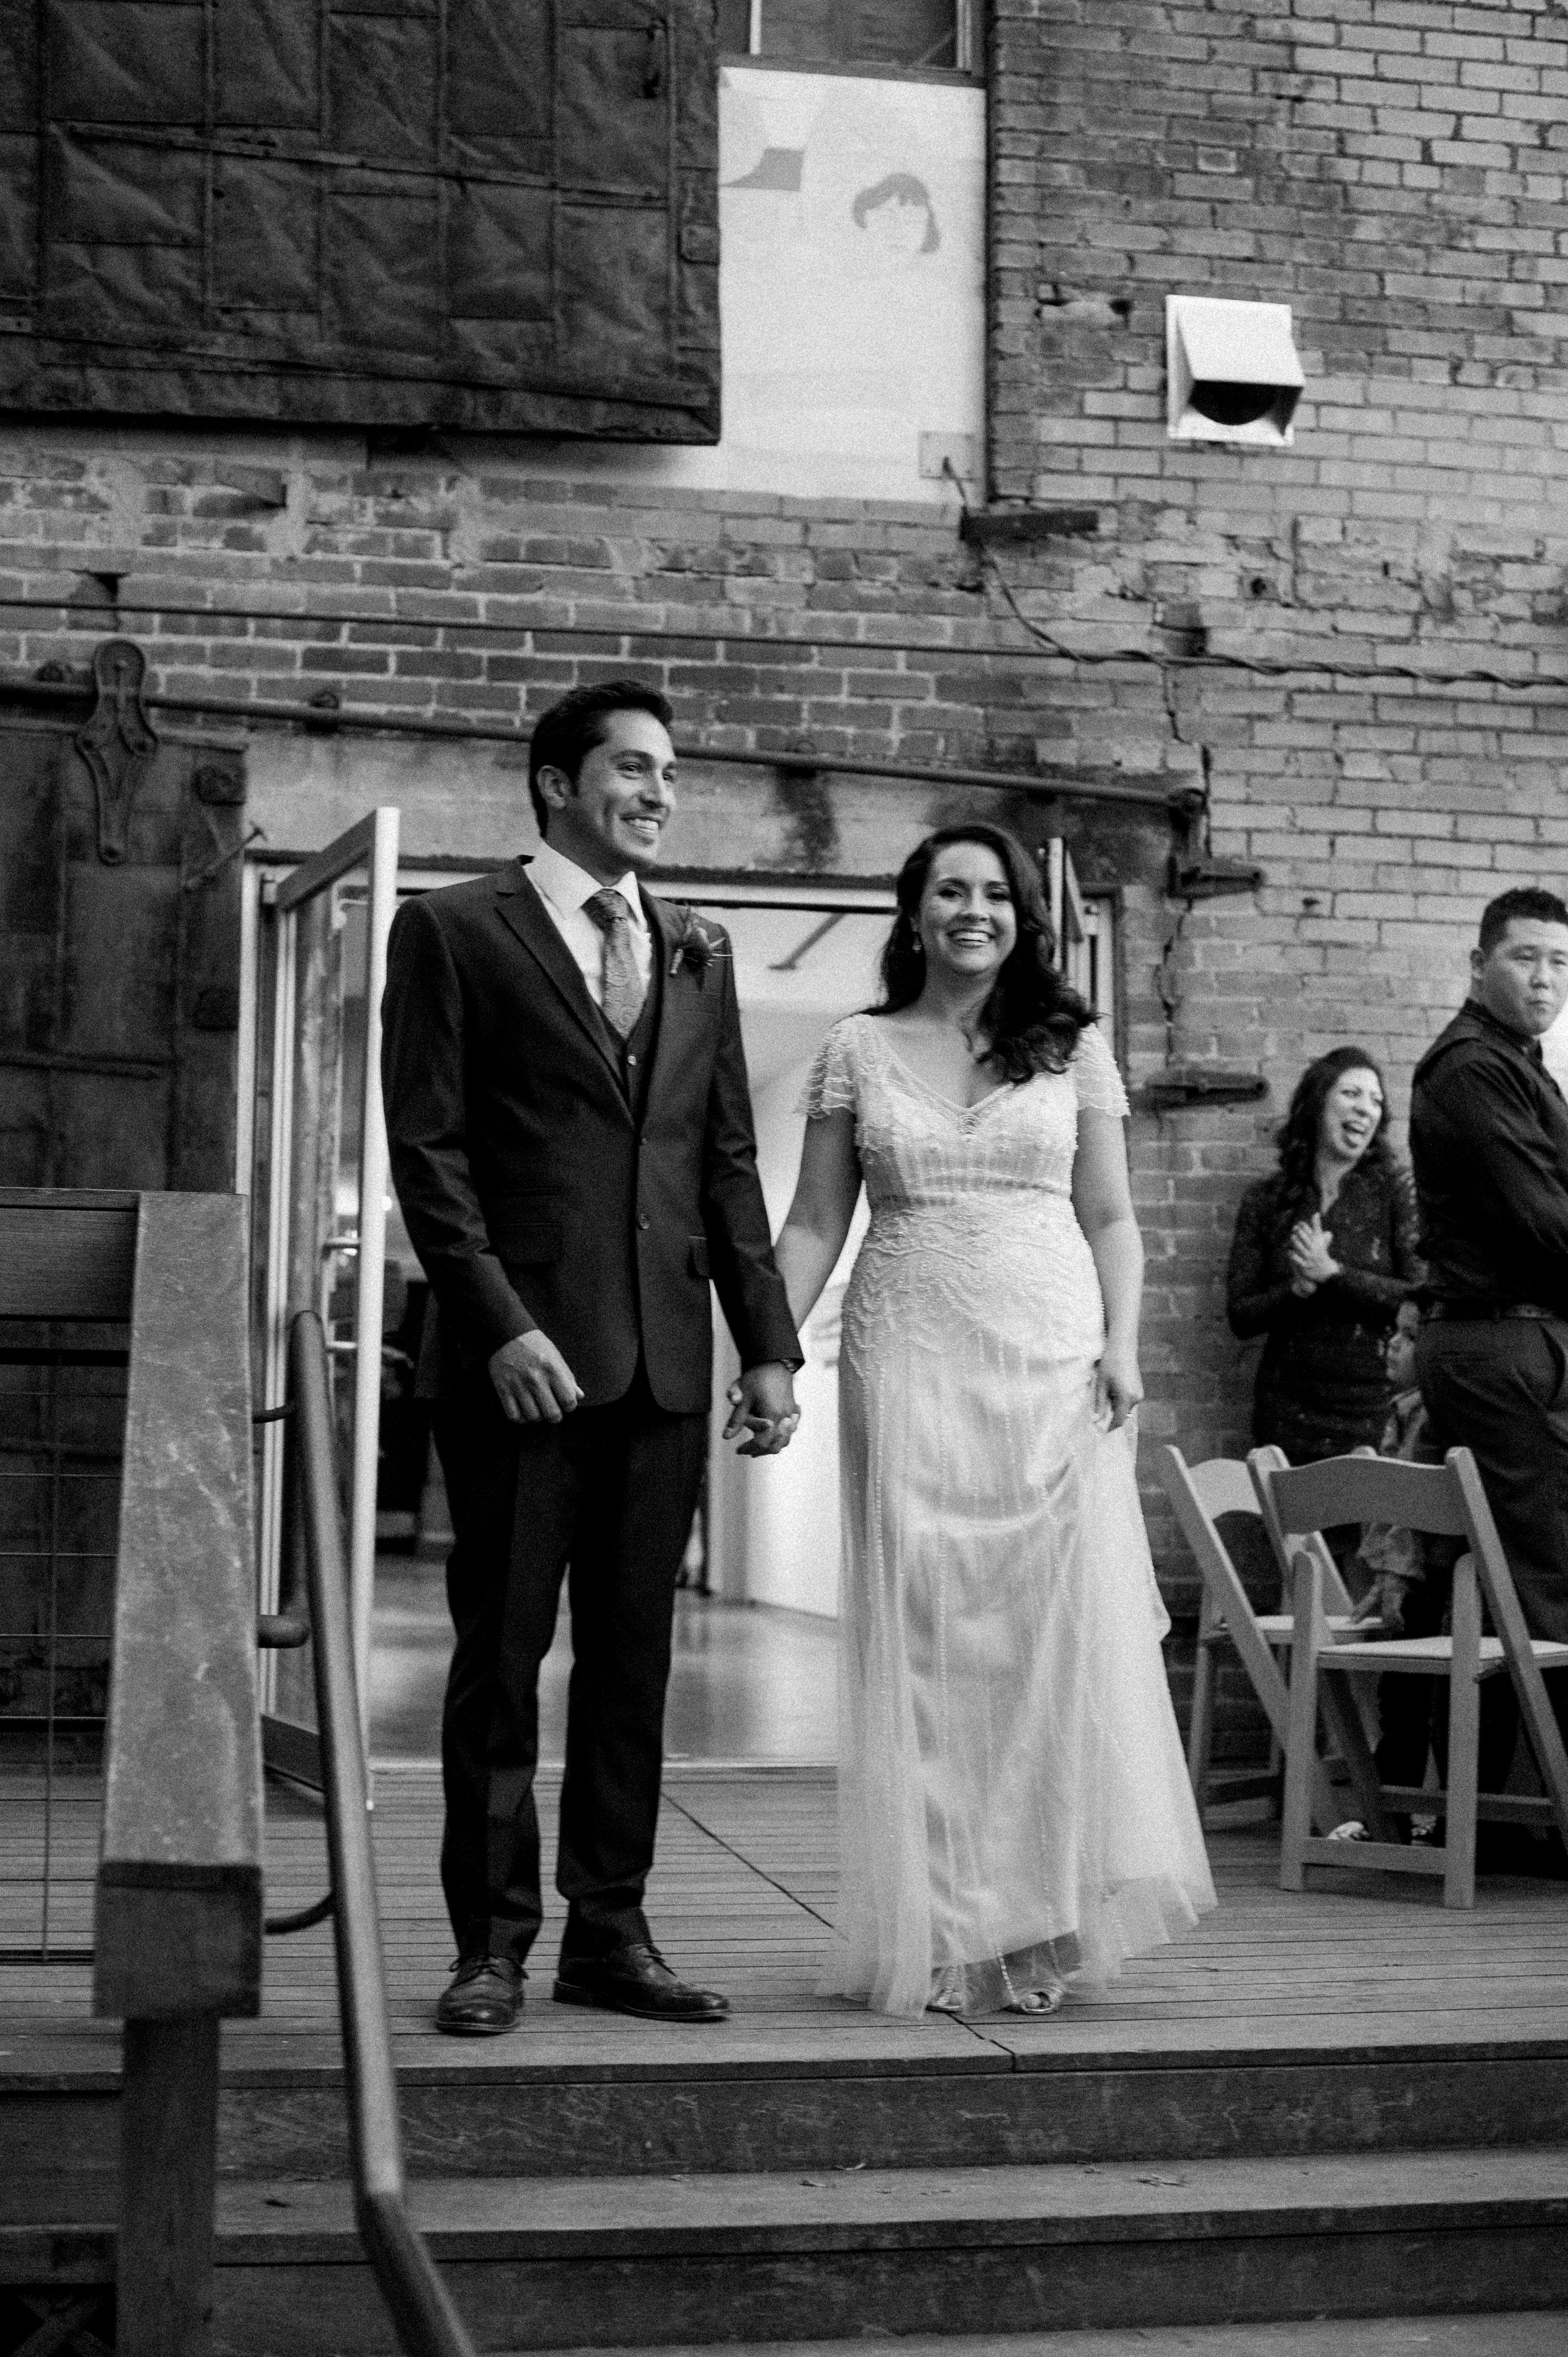 outdoor wedding venues in fort worth tx%0A Fort Worth wedding venue   Artspace      photo by  Jenny McCann   artspace     fortworthwedding